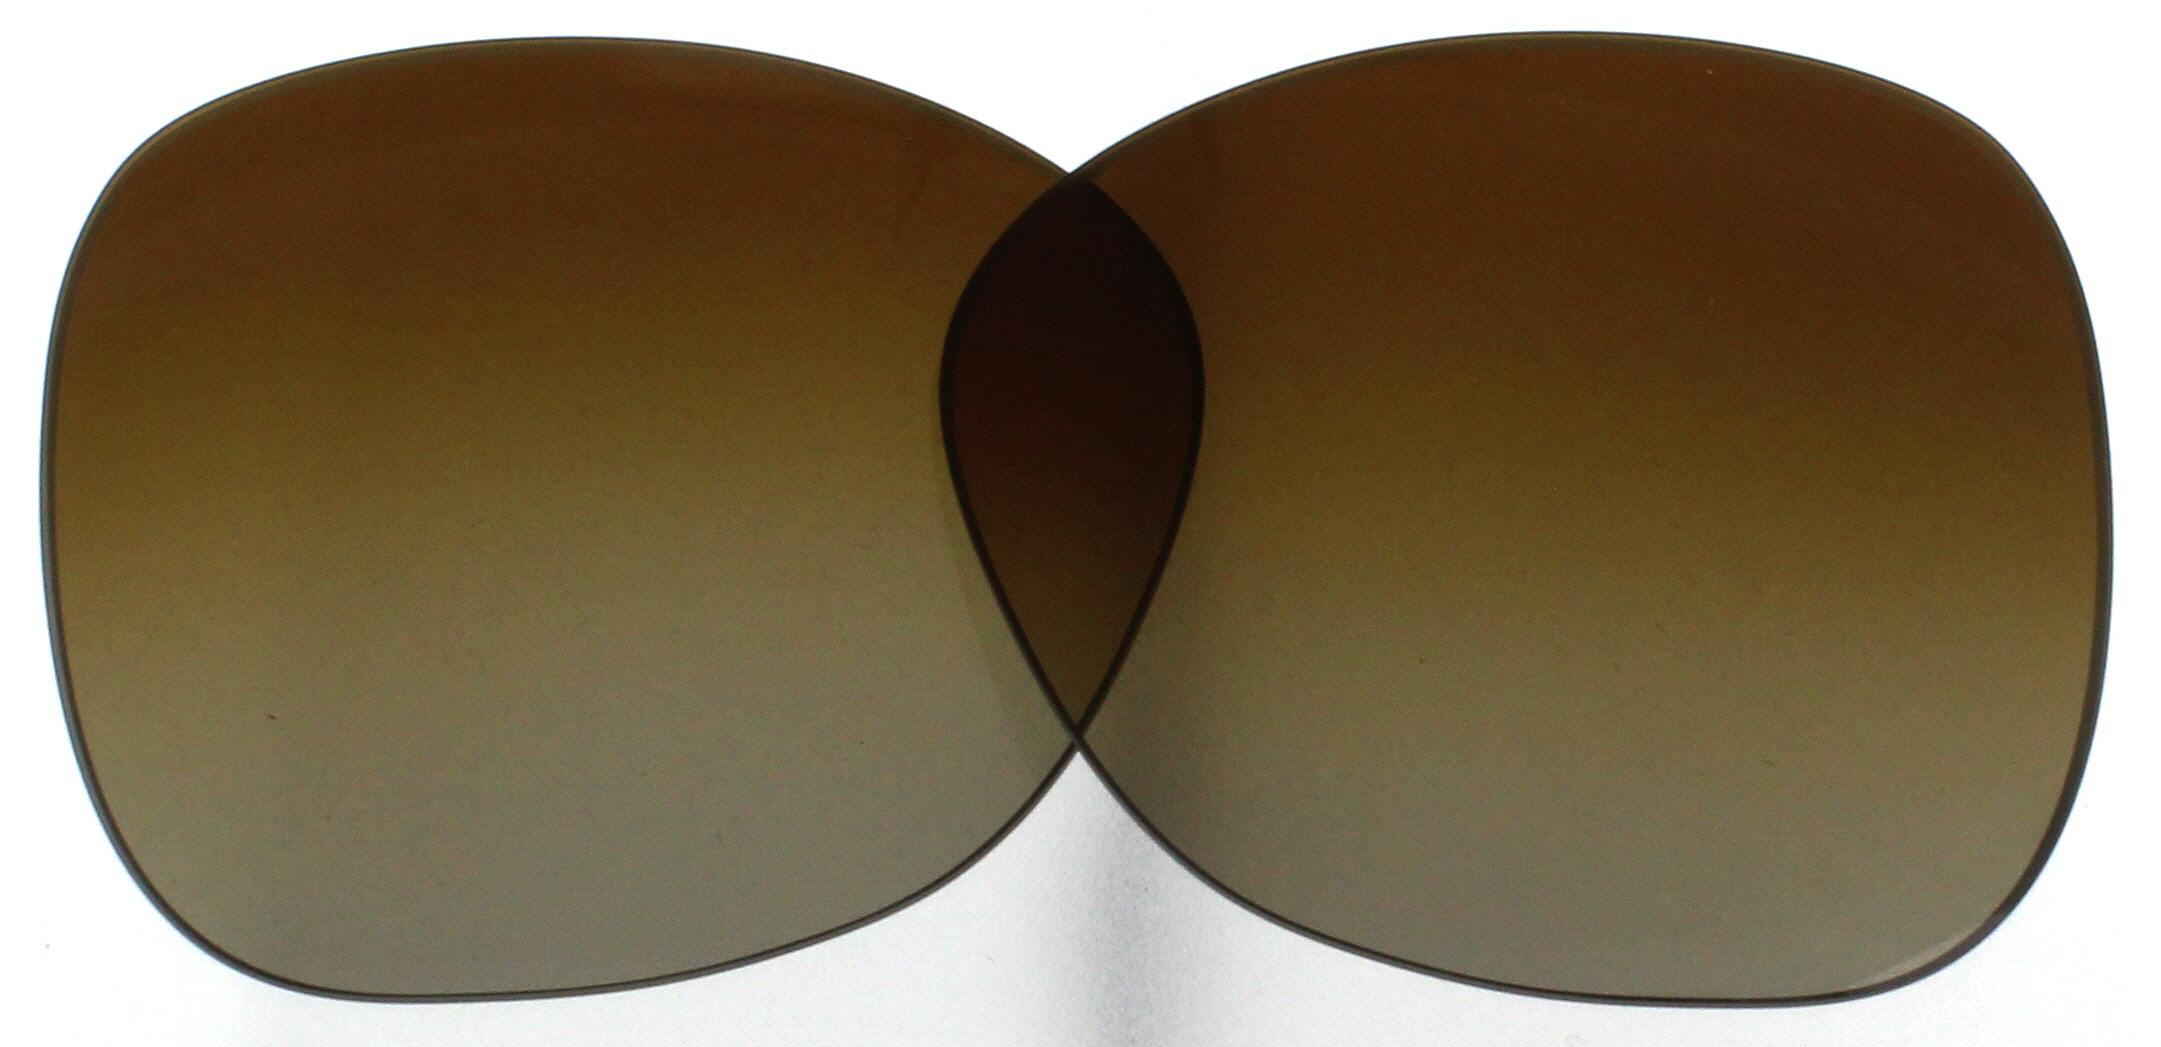 BURBERRY-Replacement-Lenses-BE4235Q-Polar-Brown-Gradient-57MM